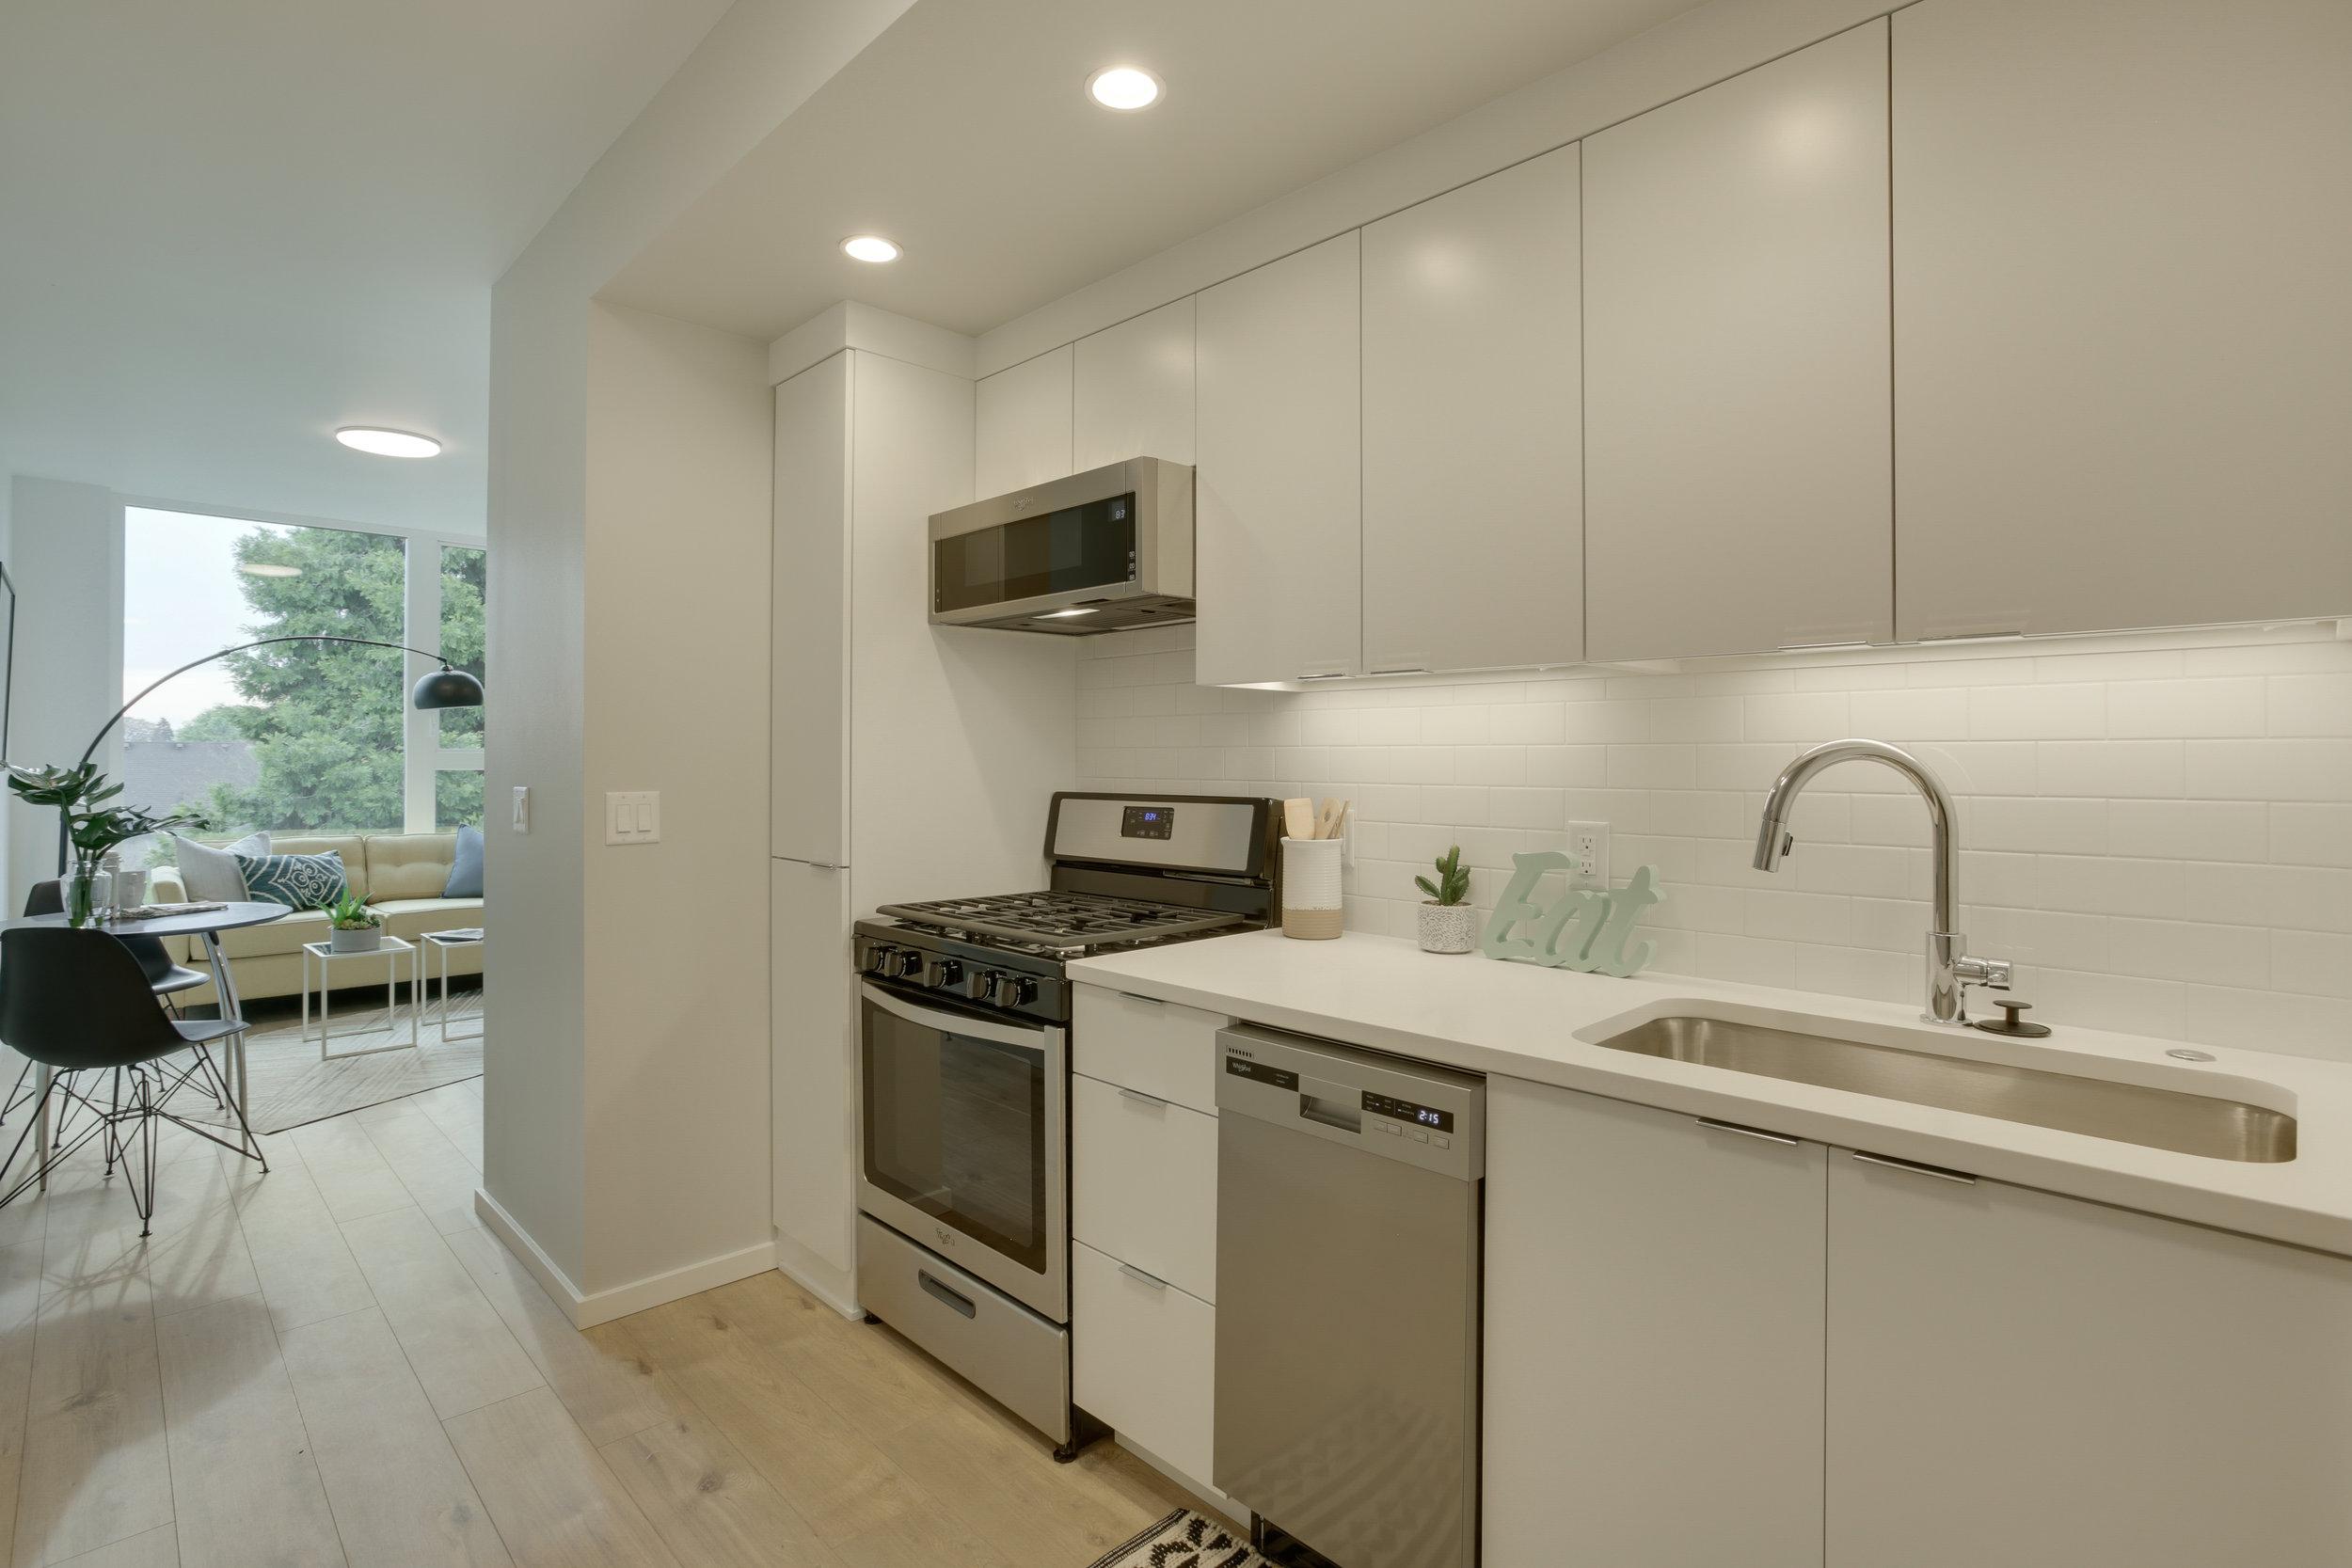 7 kitchen unit 304.jpg